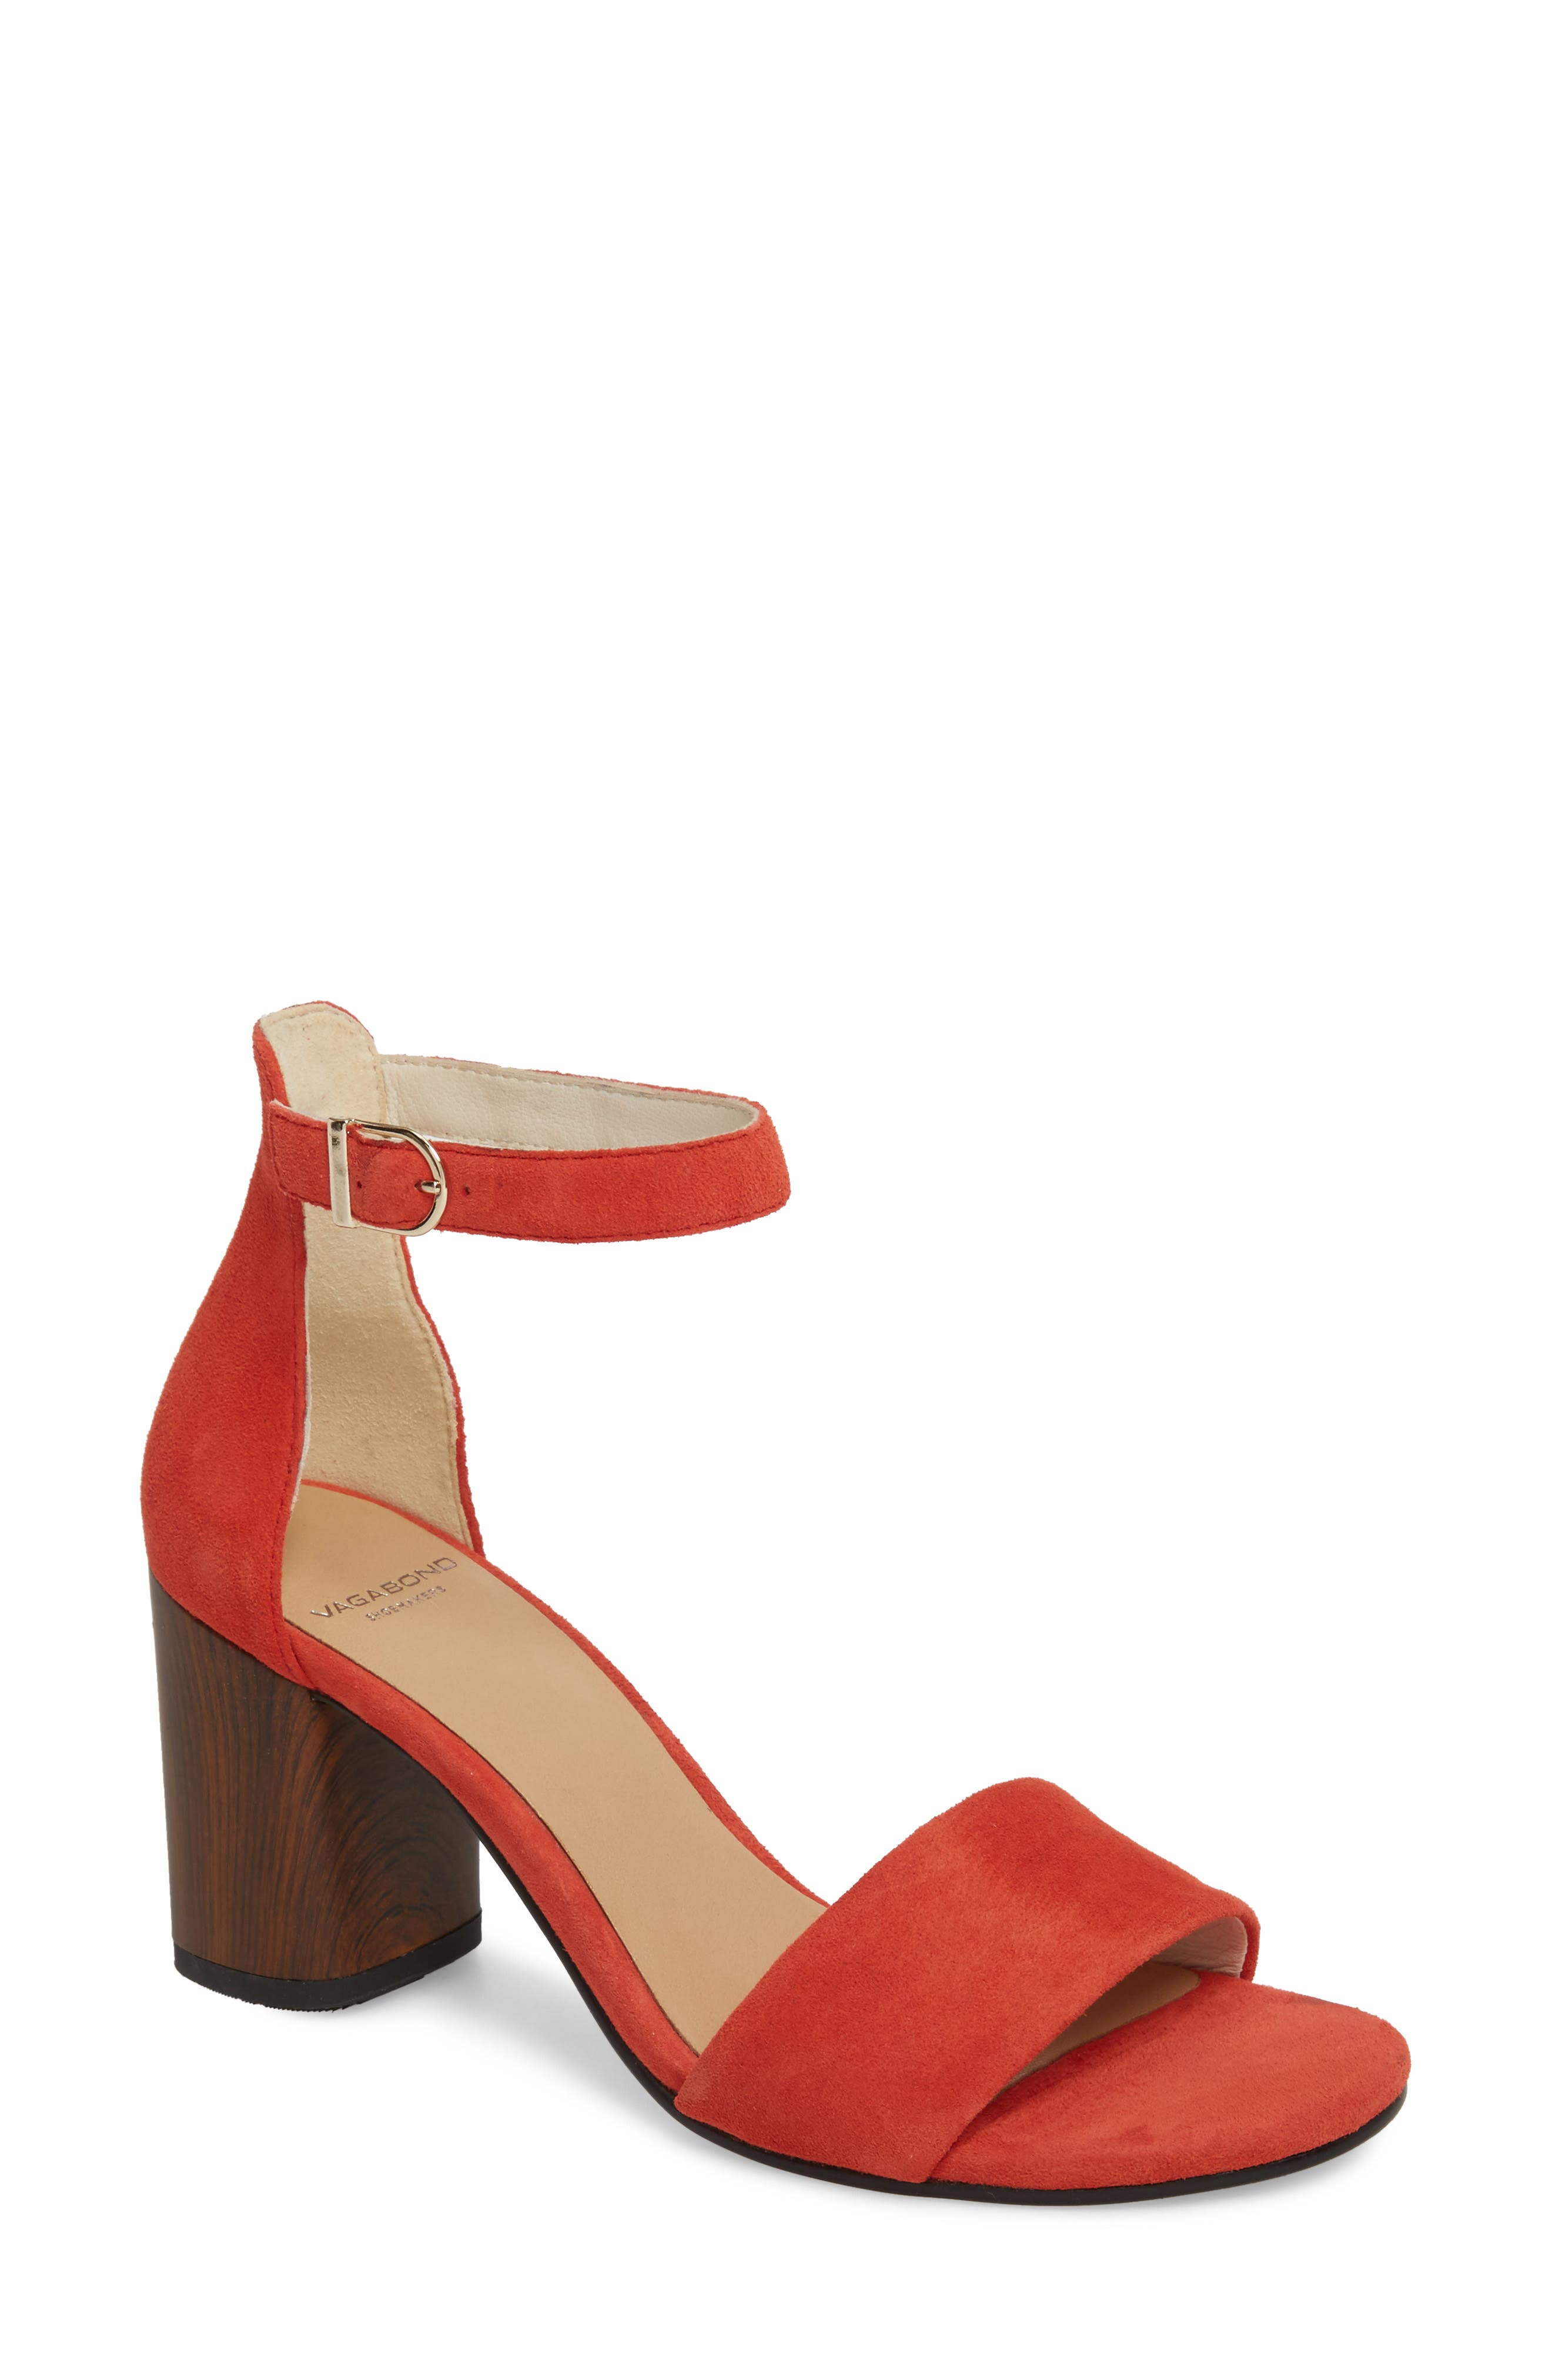 Carol Ankle Strap Sandal,                         Main,                         color, Coral Suede